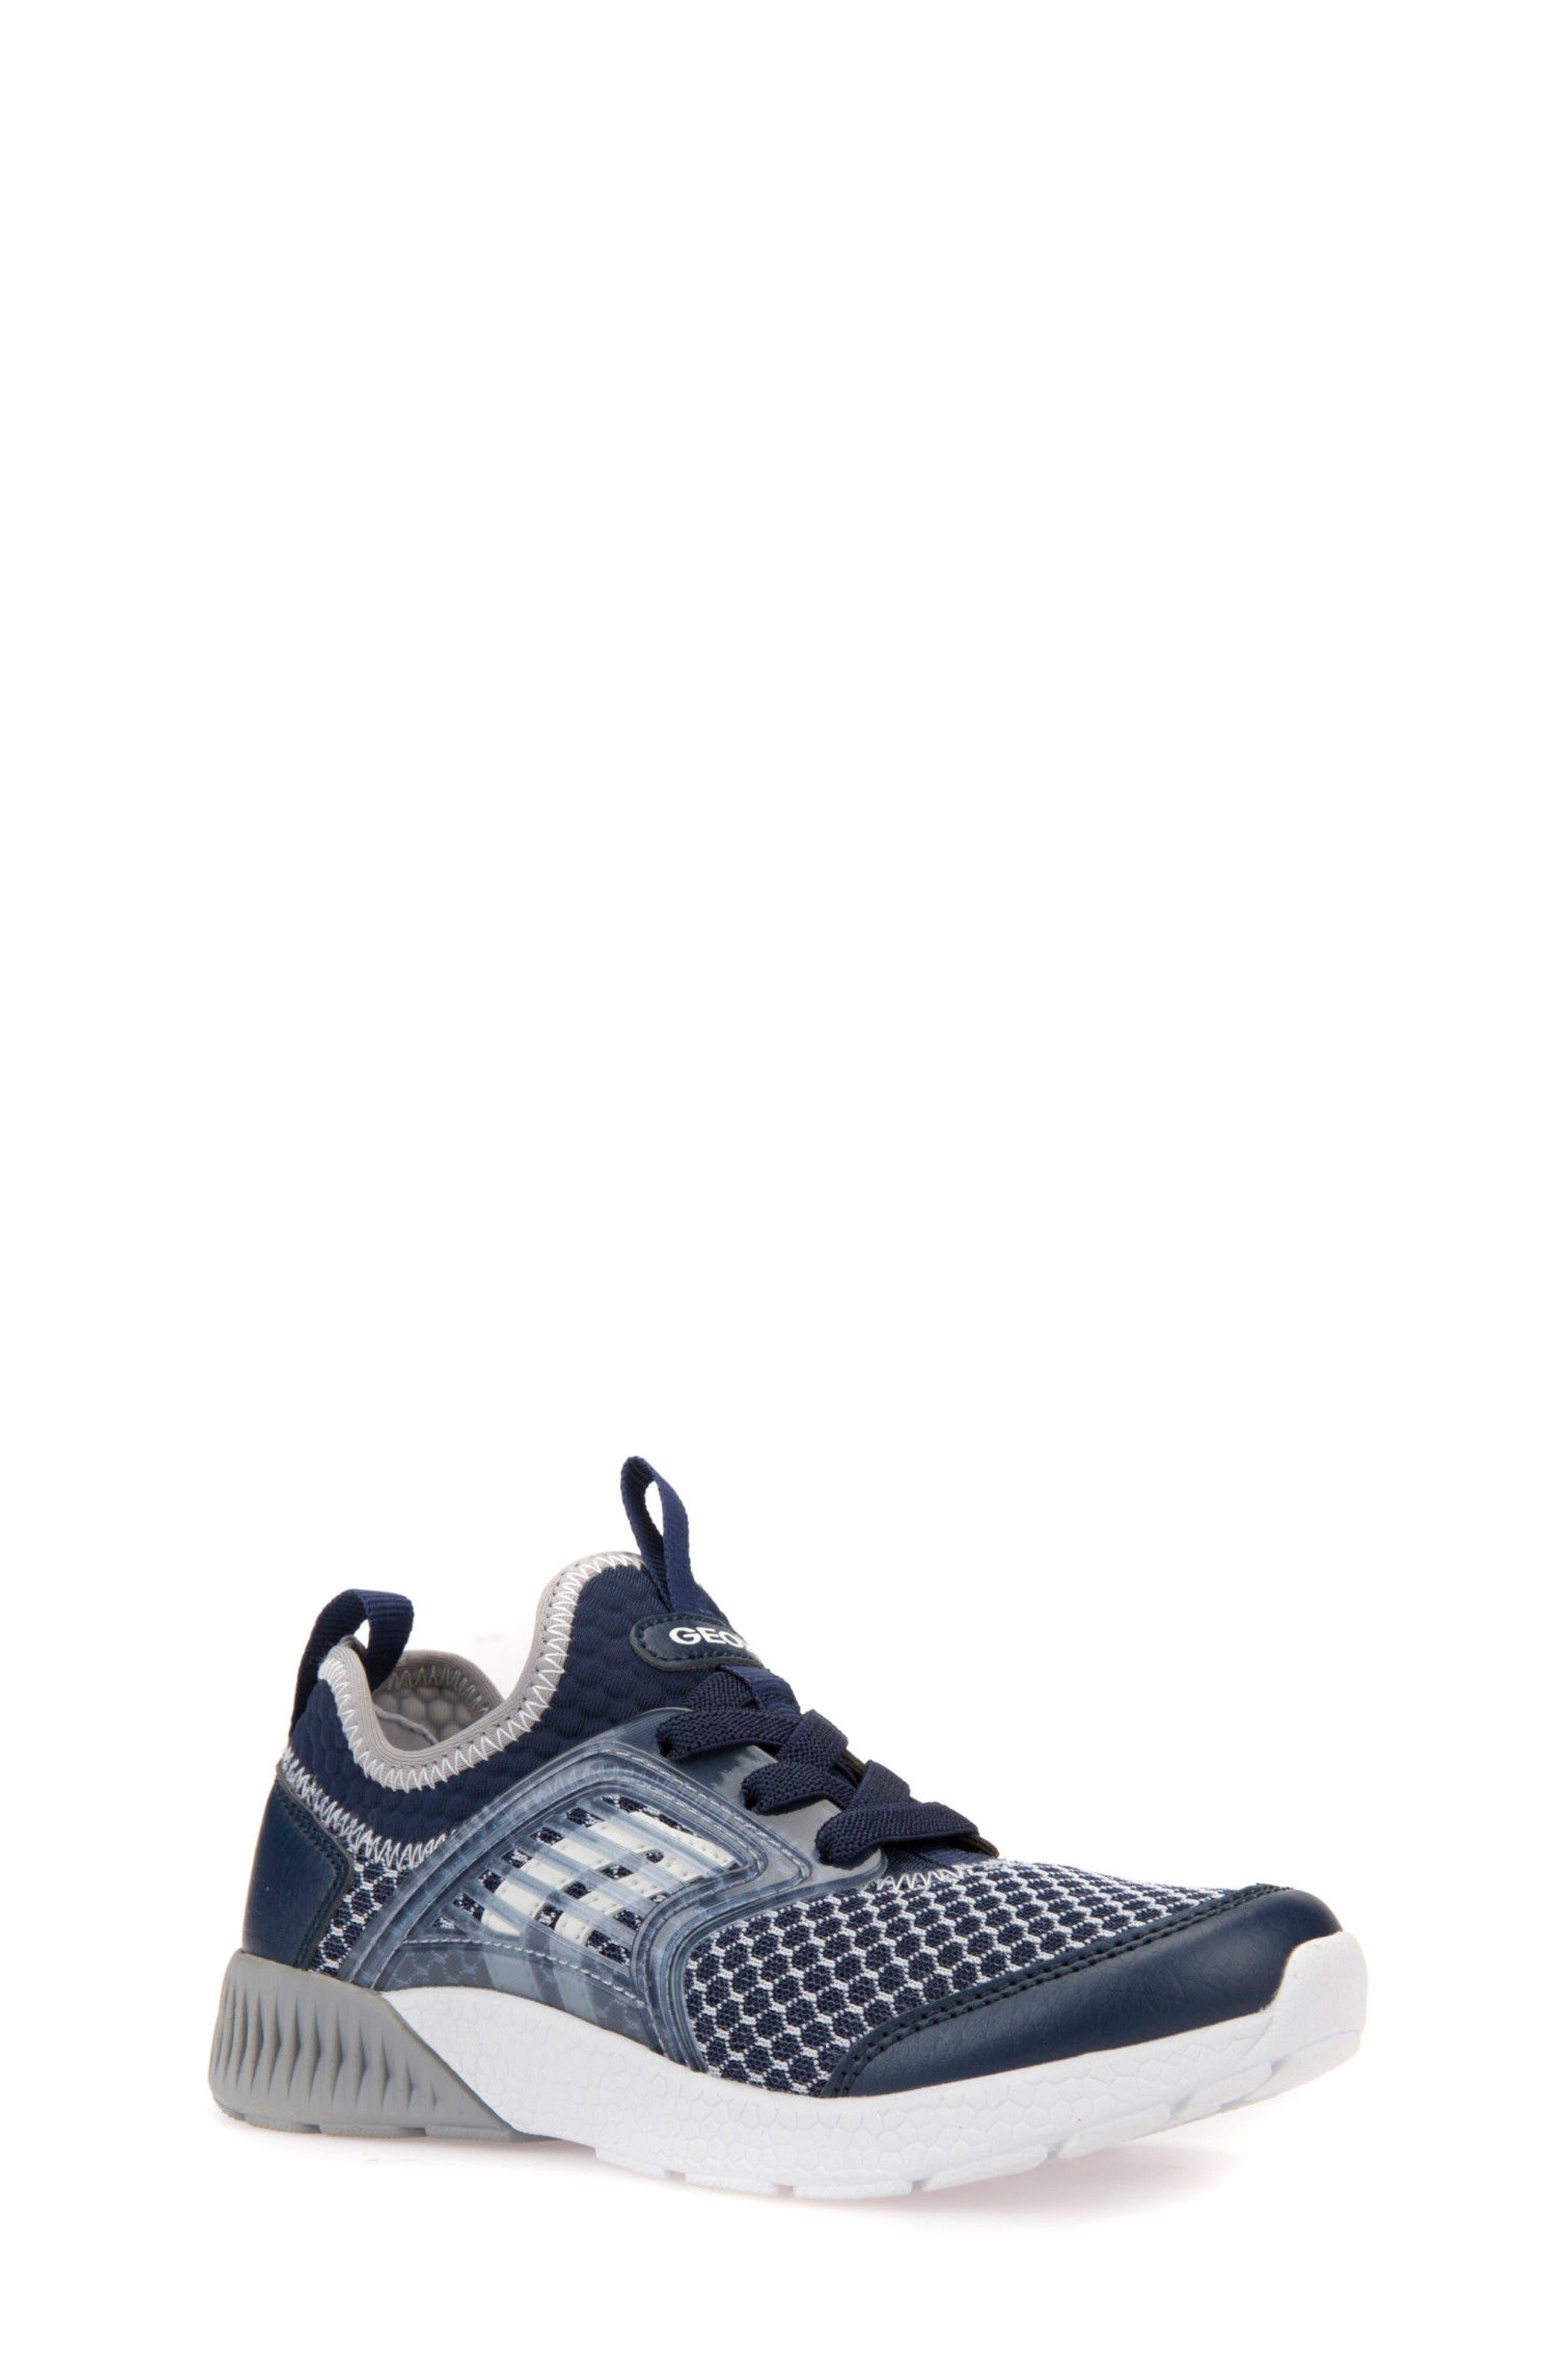 Sveth Sock Sneaker,                             Main thumbnail 1, color,                             Navy/ Grey